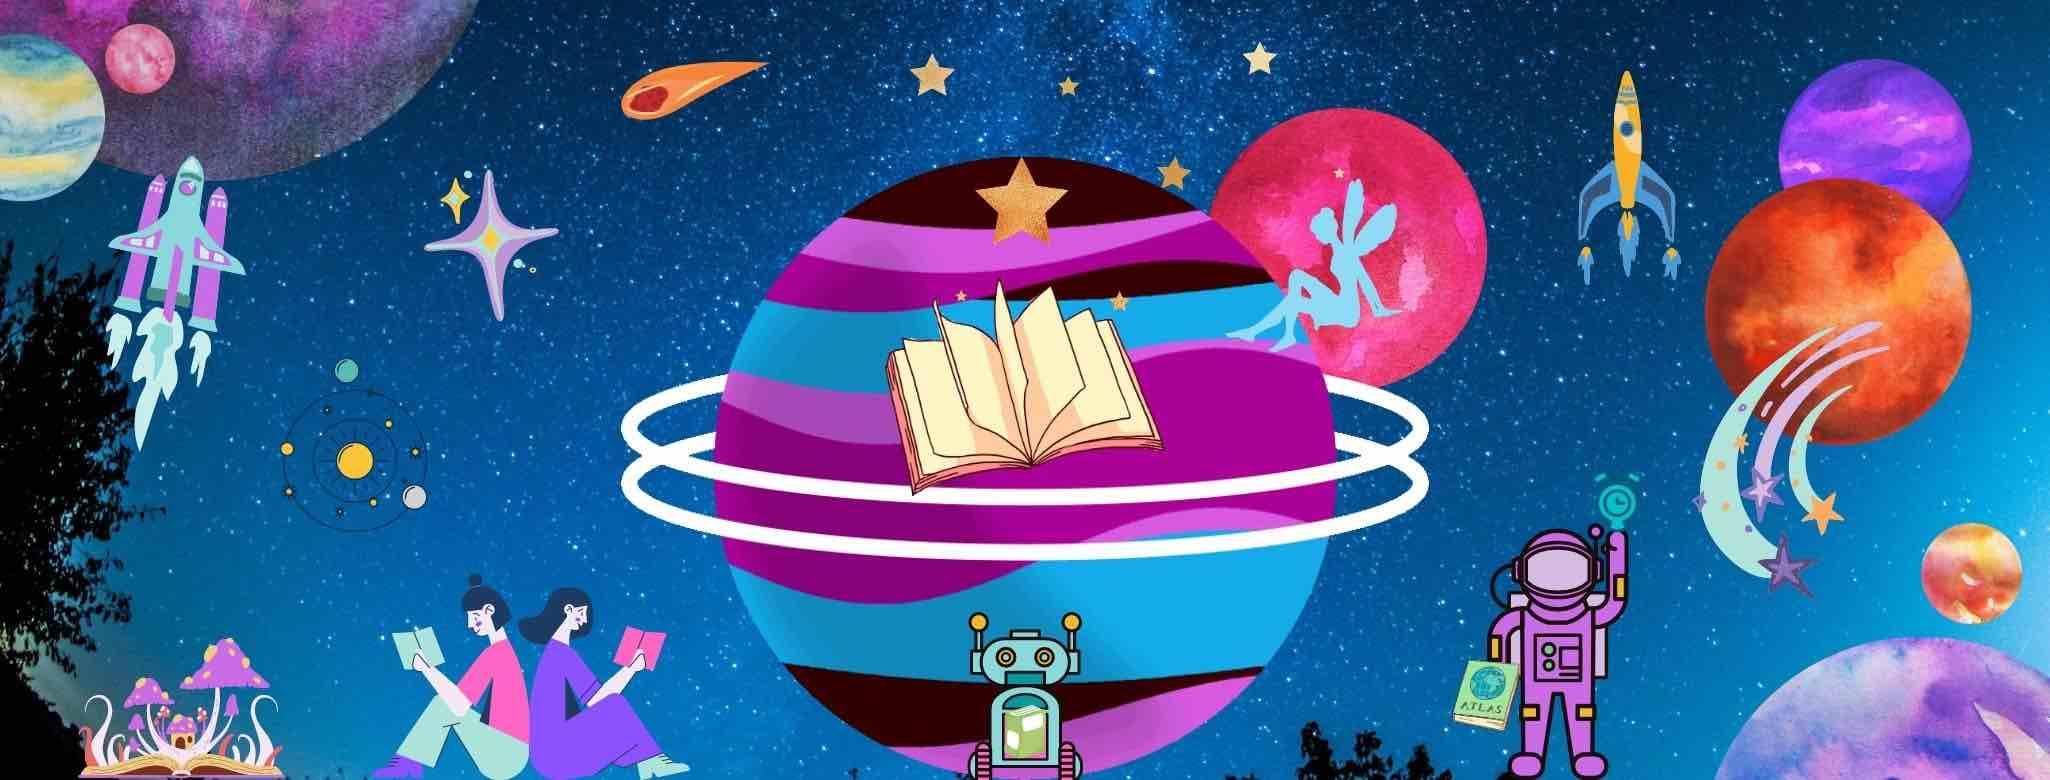 blog science-fiction roman sf